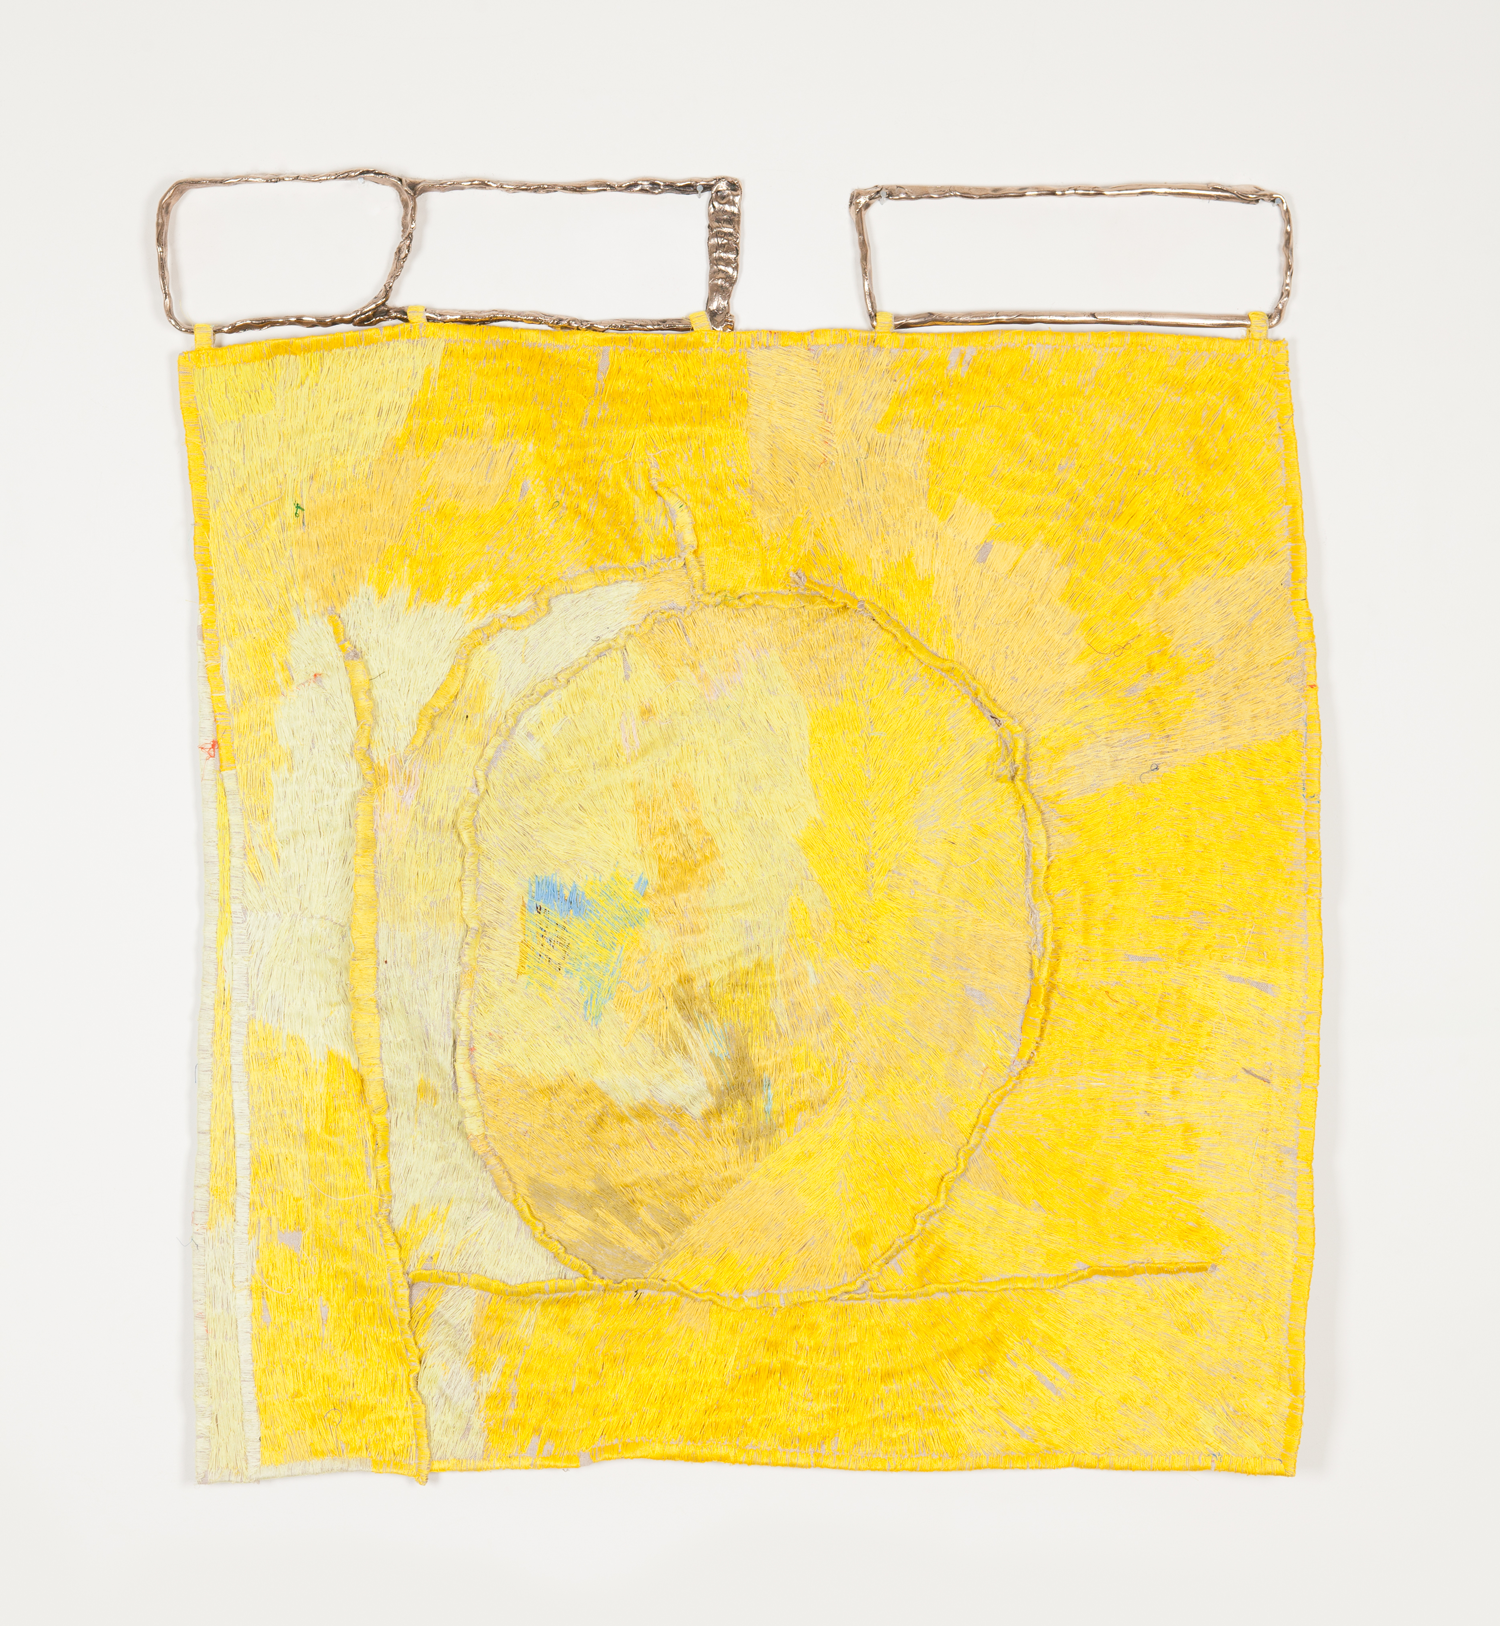 TEELAH GEORGE  Warm sun feeling  2019 thread, linen, bronze 105 × 95 cm